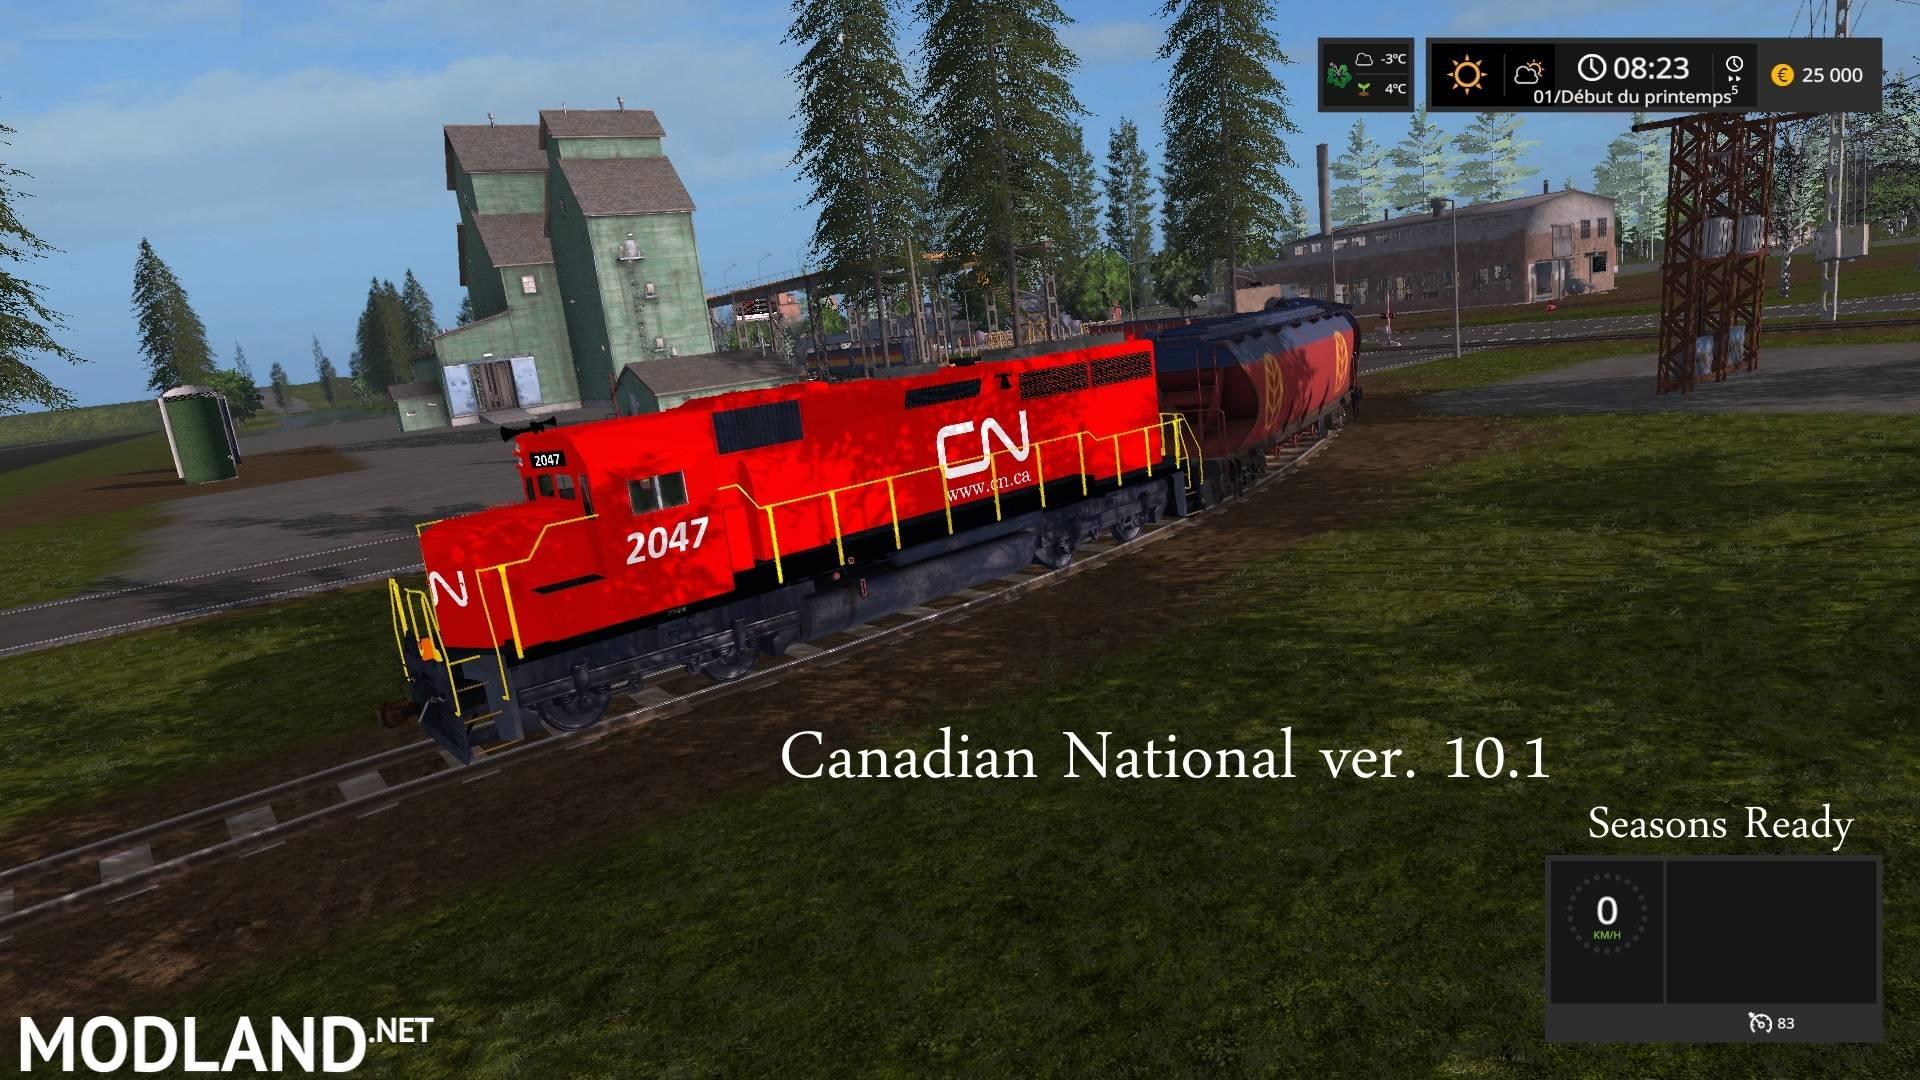 Canadian National 101 seasons Canadian National